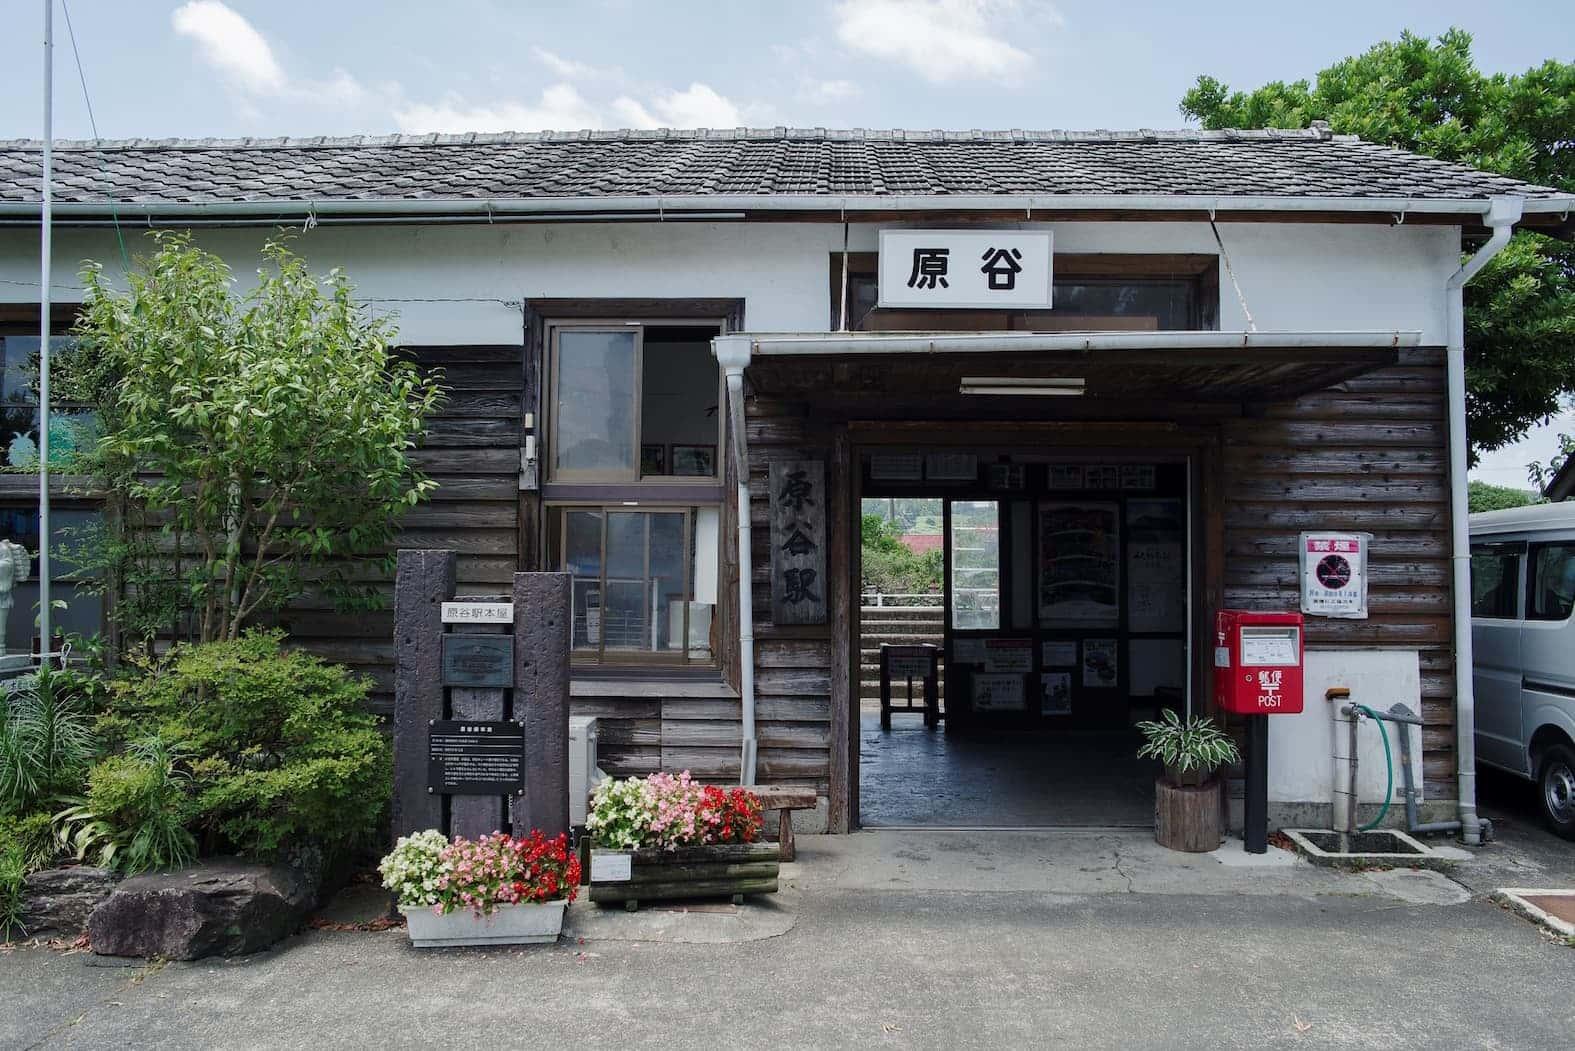 Tenryu Hamanako estrada de ferro